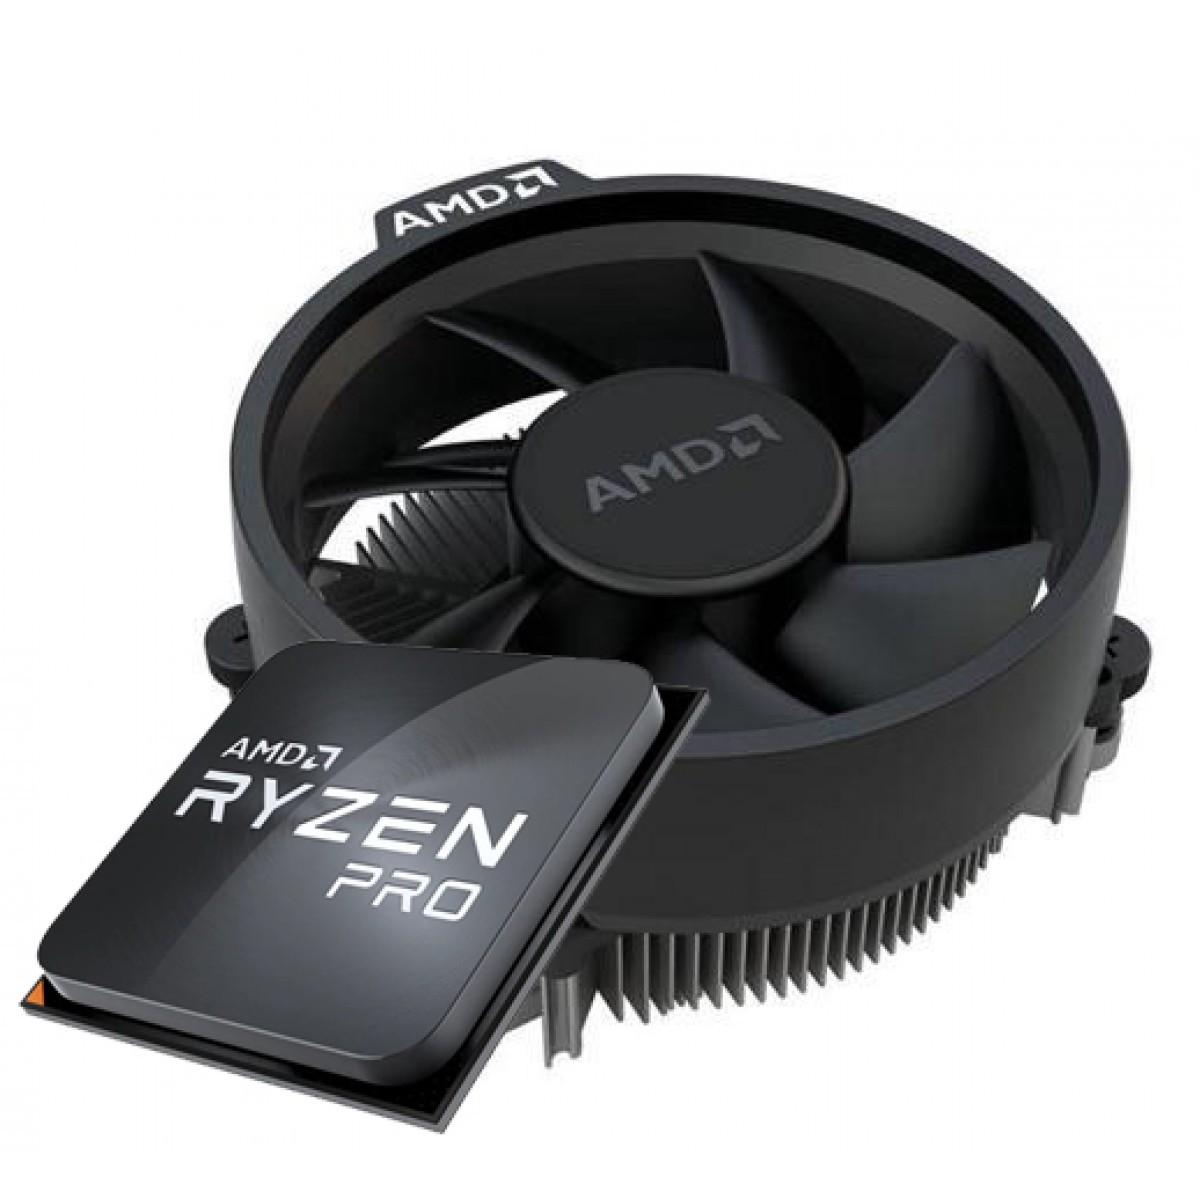 Processador AMD Ryzen 3 2200G PRO 3.5GHz (3.7GHz Turbo), 4-Cores 4-Threads, Cooler Wraith Stealth, AM4, YD220BC5FBMPK, OEM, Sem Caixa